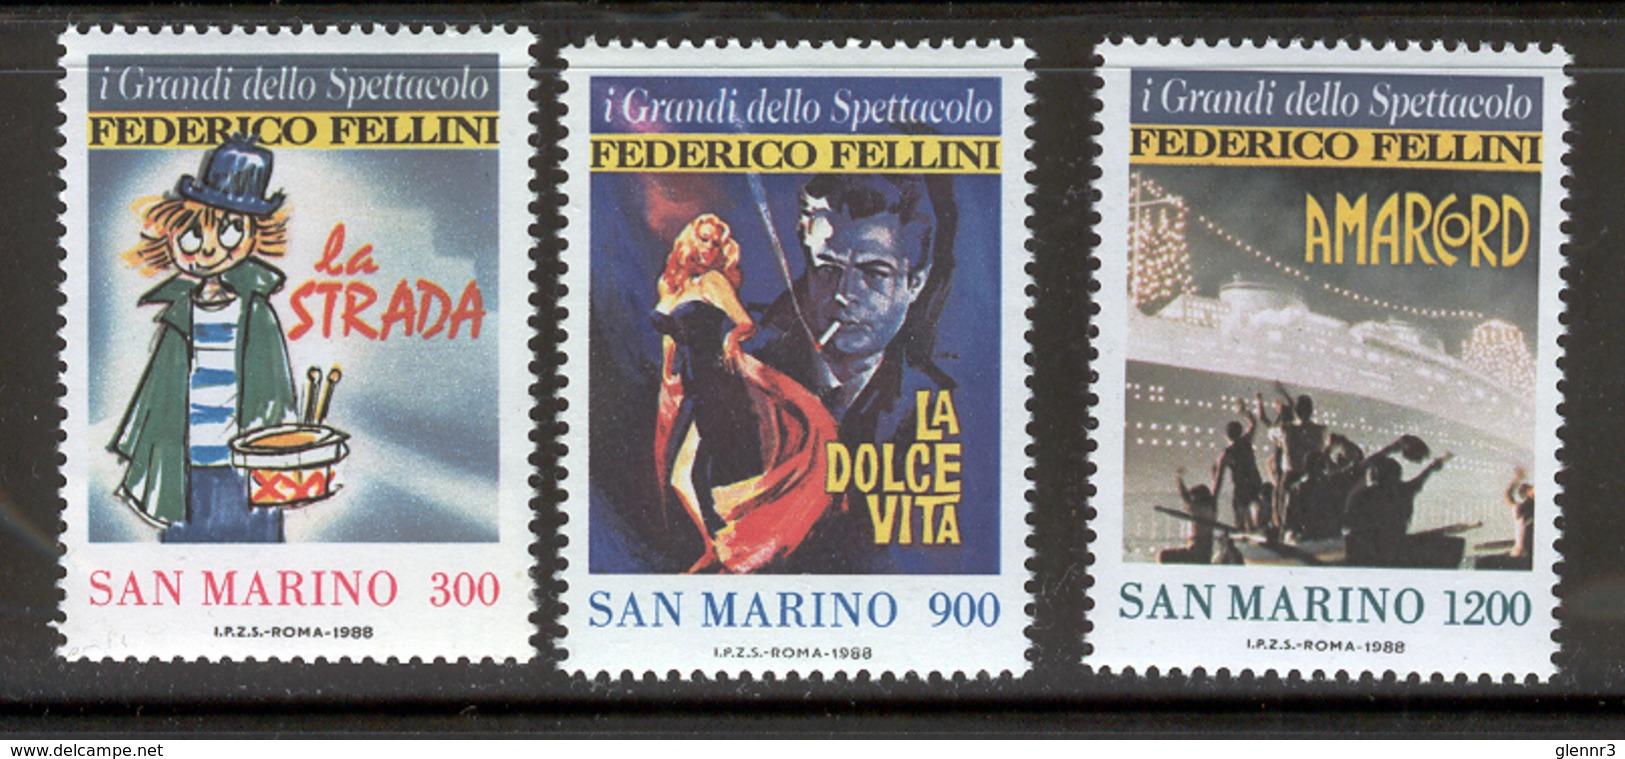 SAN MARINO 1988 Federico Fellini Film Posters Scott Cat. No(s). 1157-1159 MNH - Unused Stamps